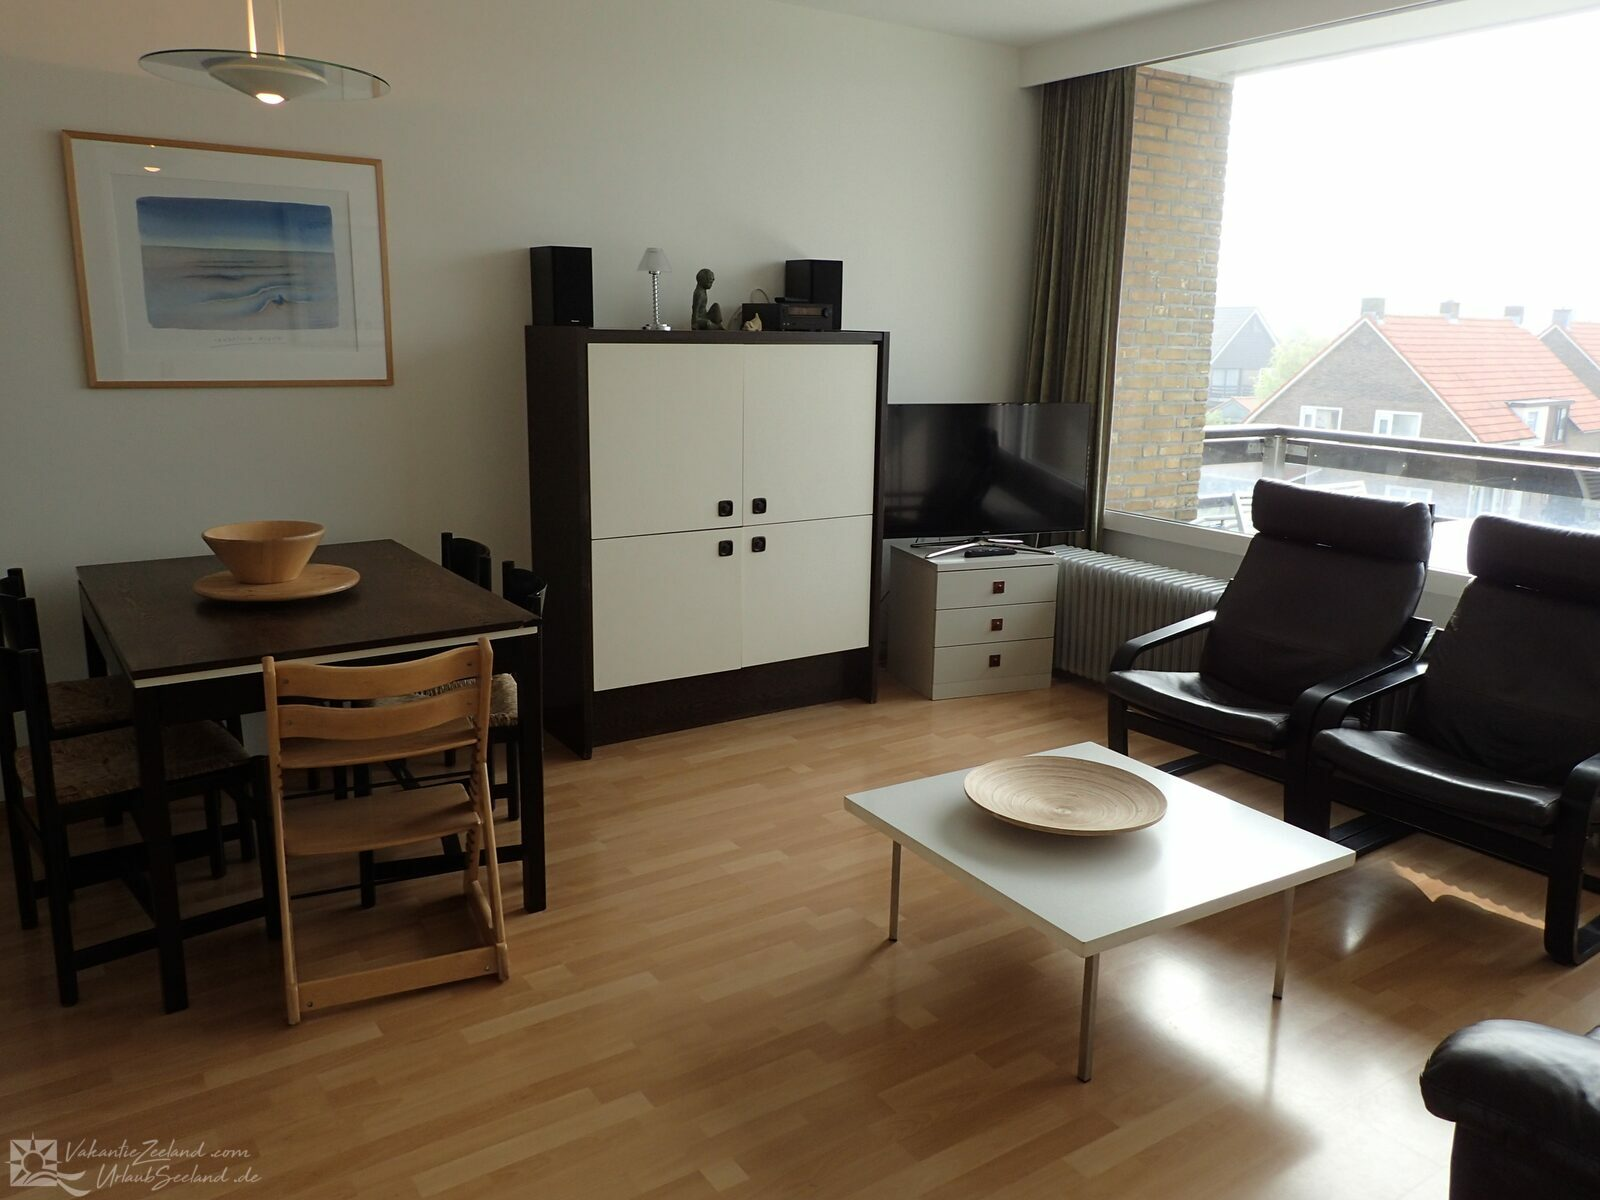 VZ922 apartment in Cadzand